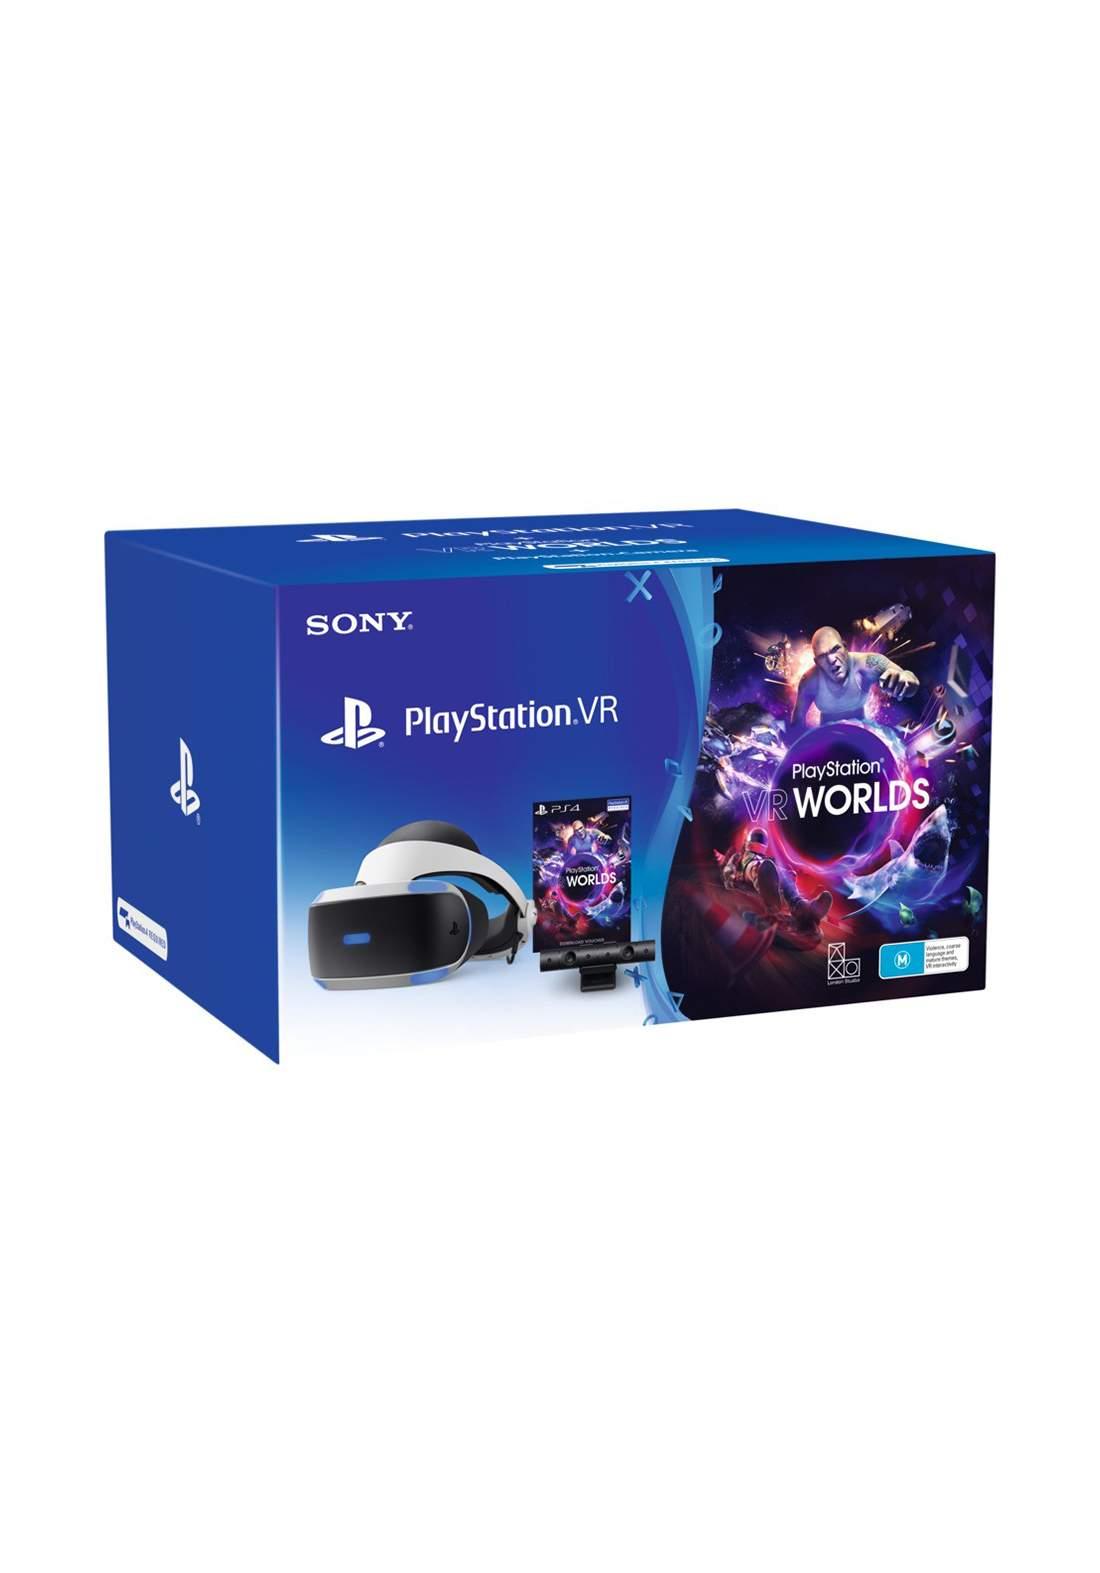 PlayStation VR with Camera & VR Worlds Bundle  حزمة كاميرا مع نظارة واقع افتراضي وسماعة بلي ستيشن